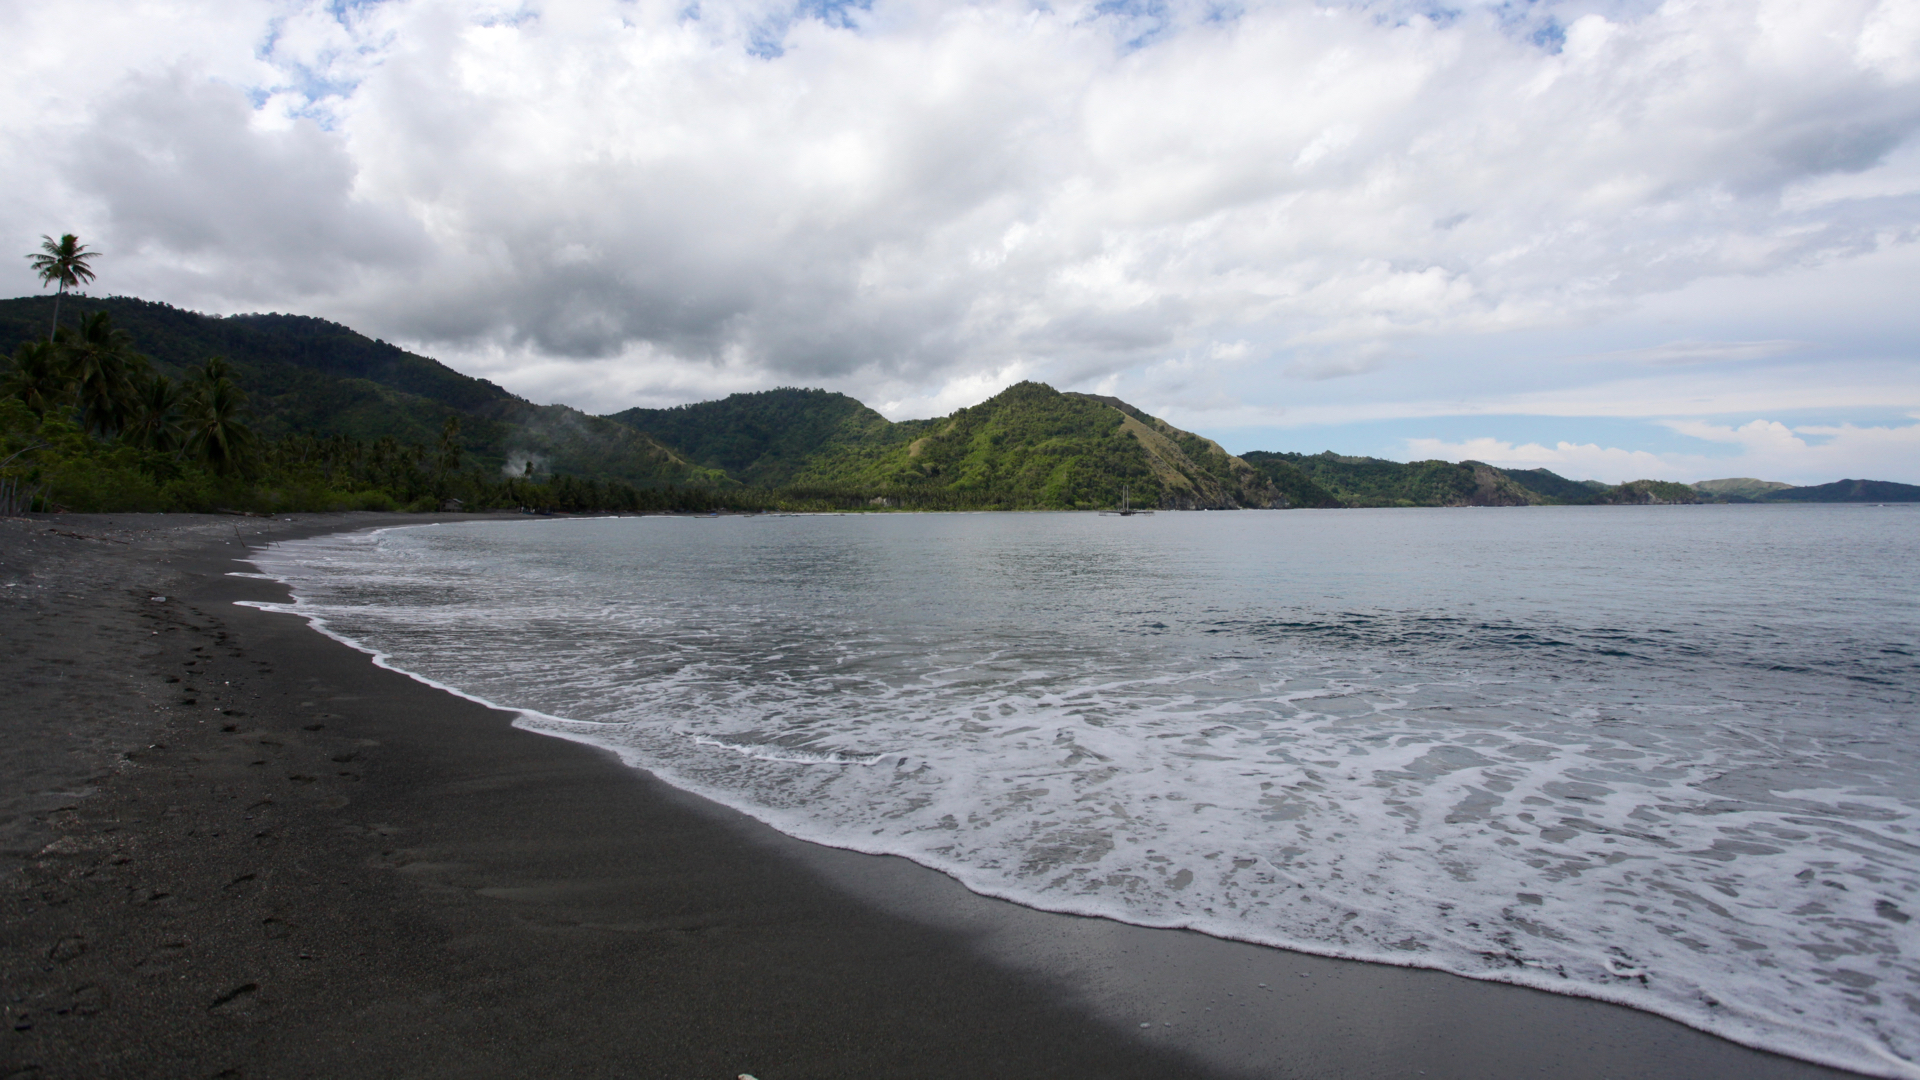 Pulau Dua